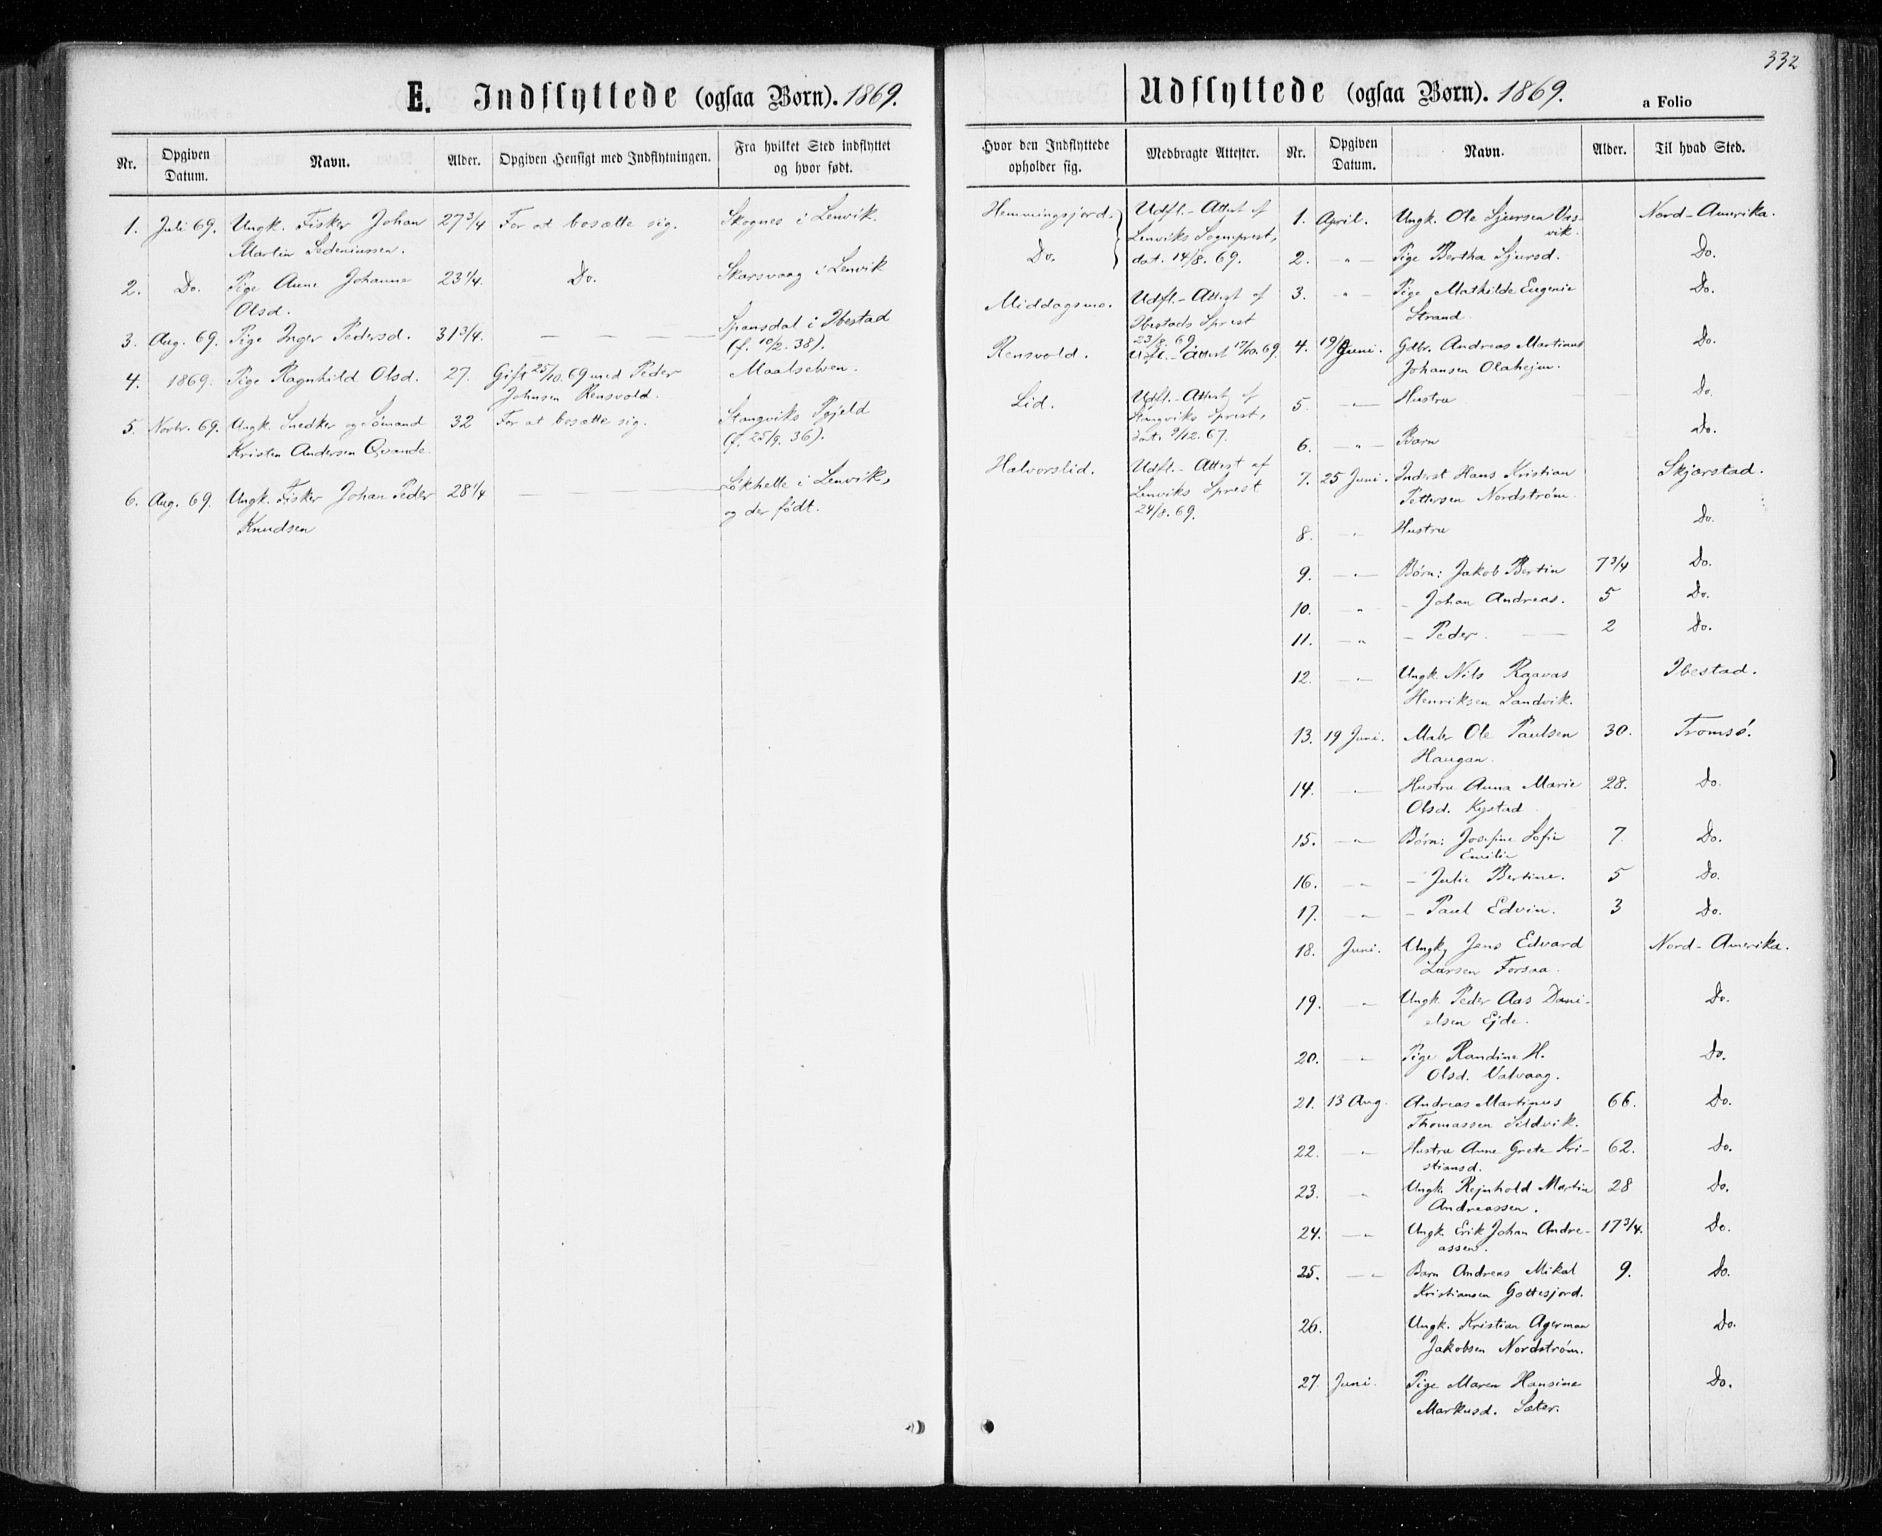 SATØ, Tranøy sokneprestkontor, I/Ia/Iaa/L0008kirke: Ministerialbok nr. 8, 1867-1877, s. 332